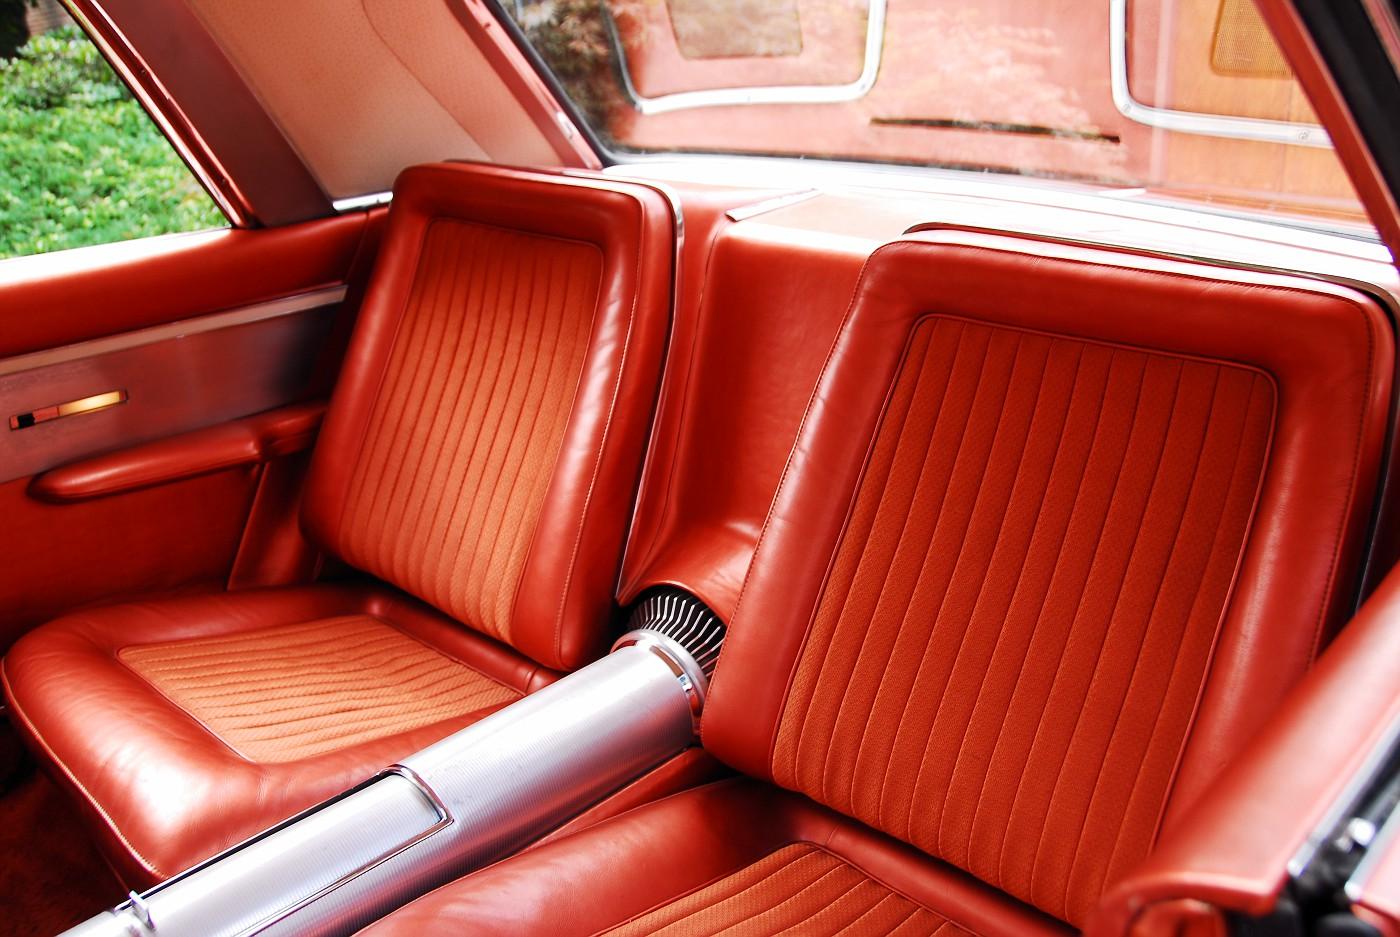 20 1963 Chrysler Ghia Turbine Car rear interior bucket seat detail view